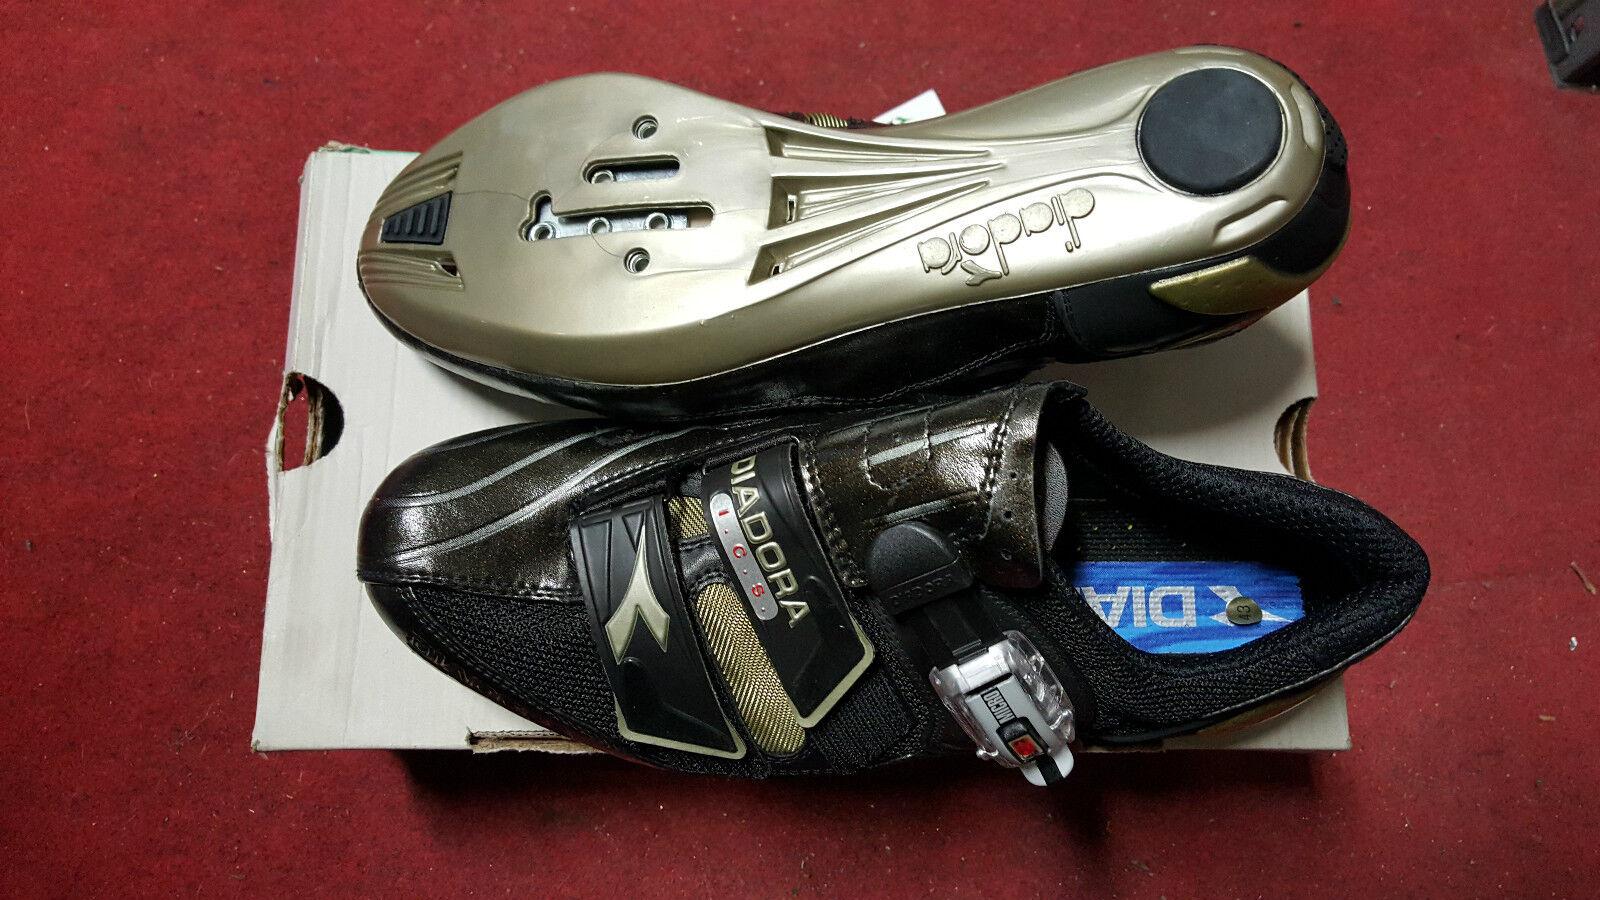 Scarpe bici corsa Diadora Gara 42 43 racing road bike scarpe